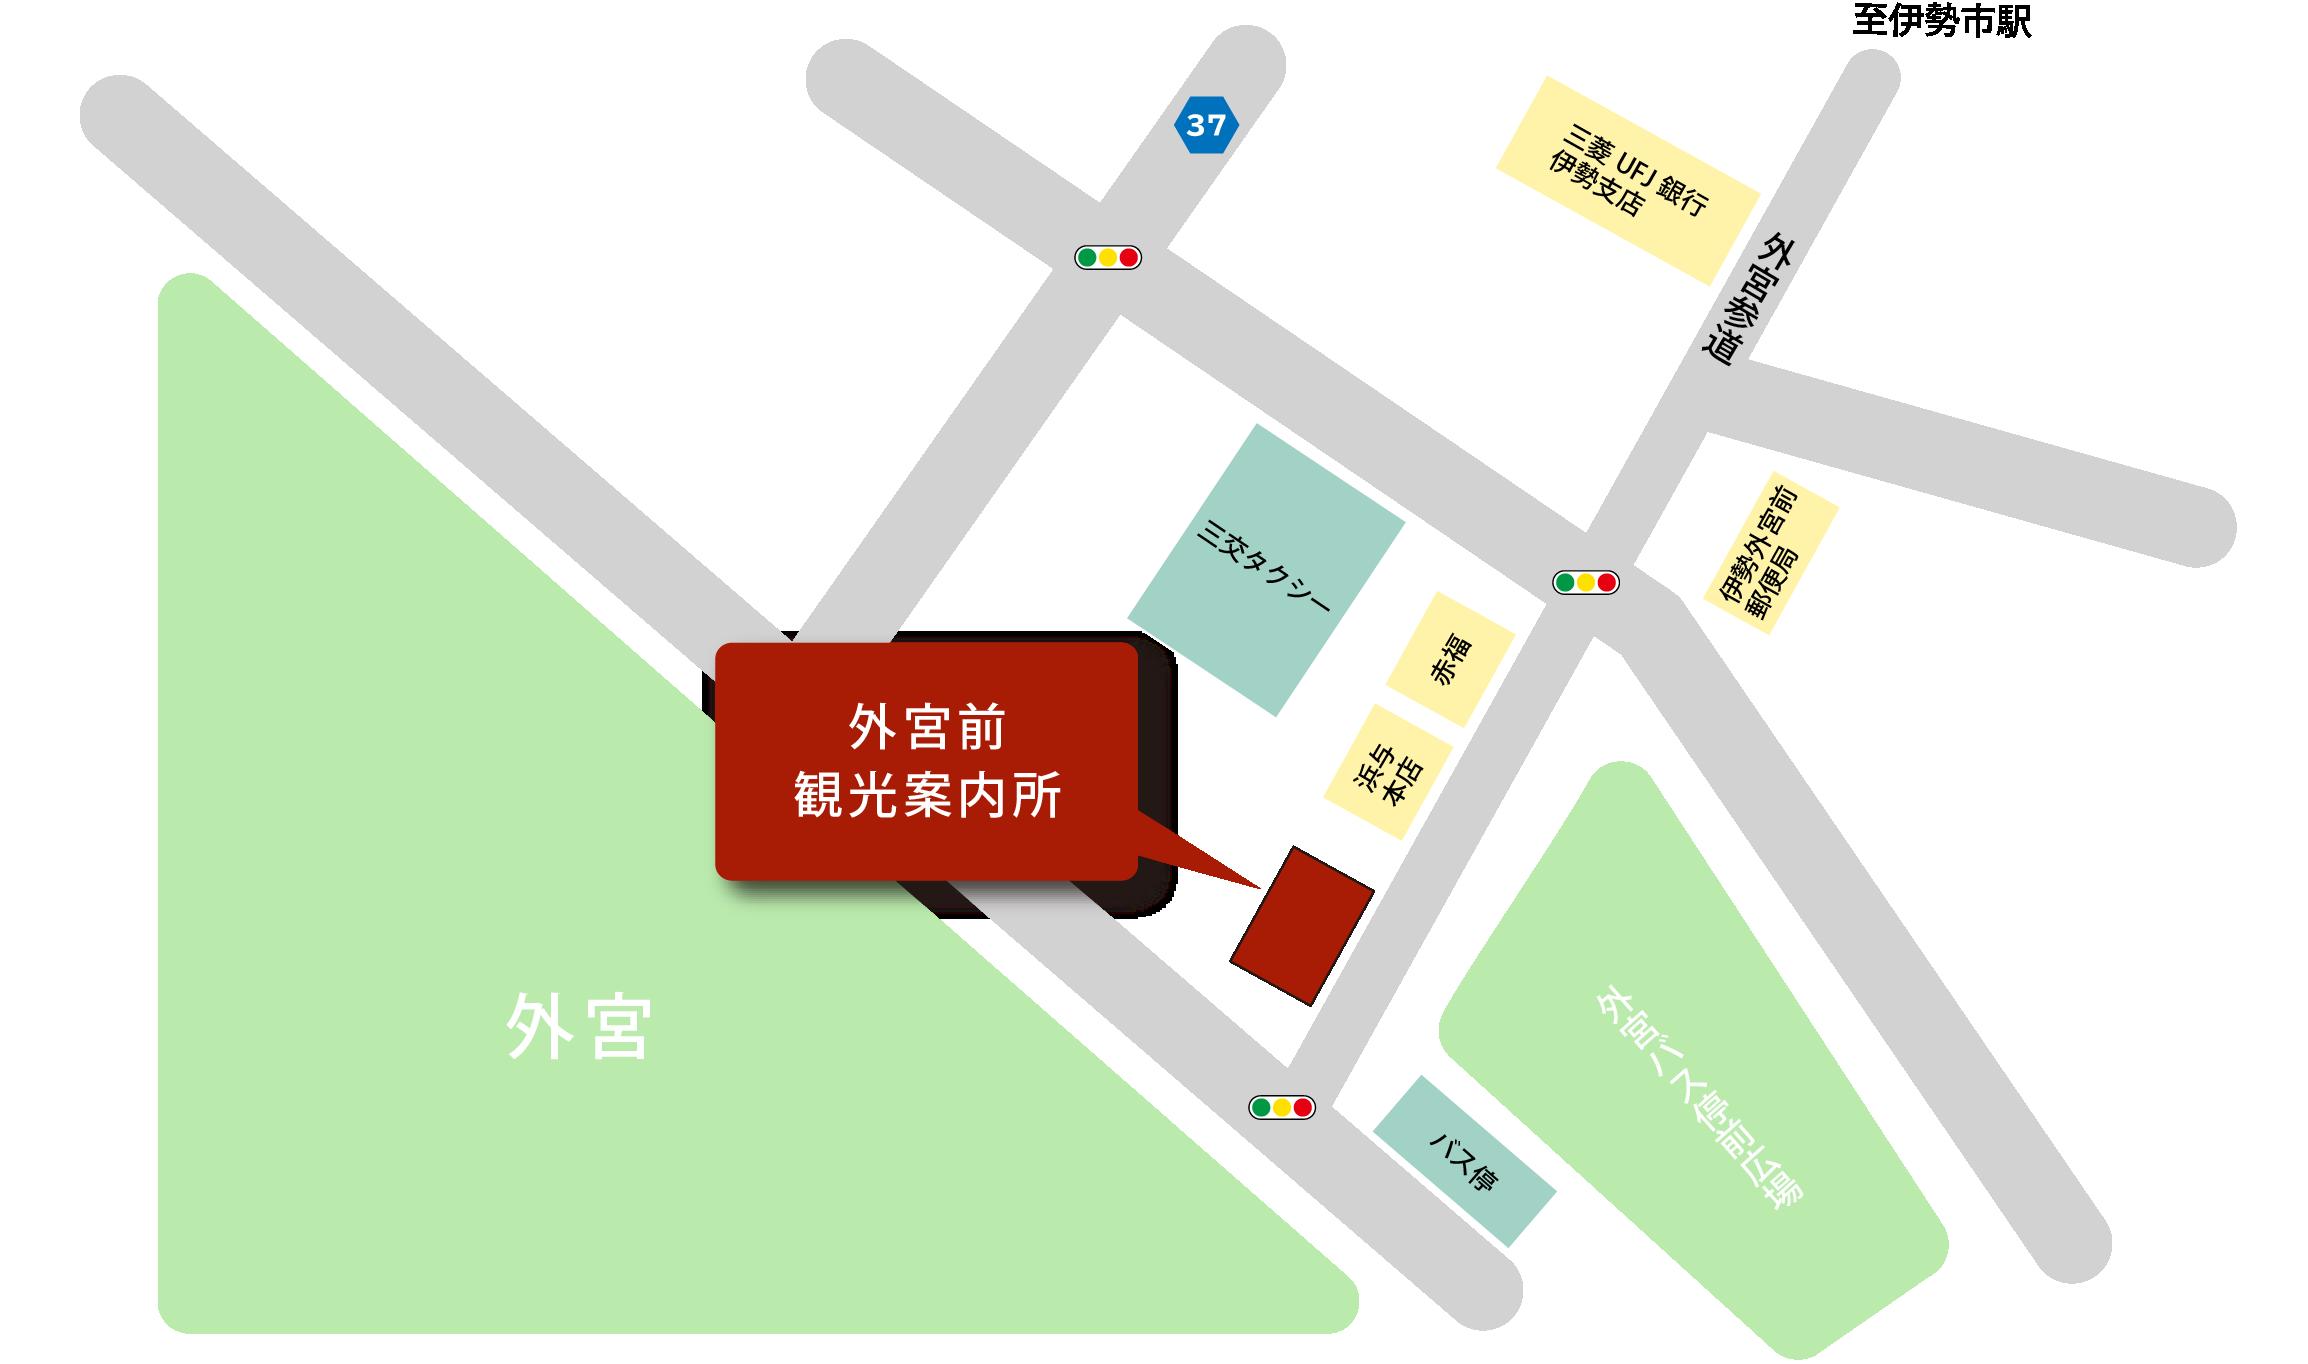 Geku-mae旅遊諮詢中心周圍的地圖